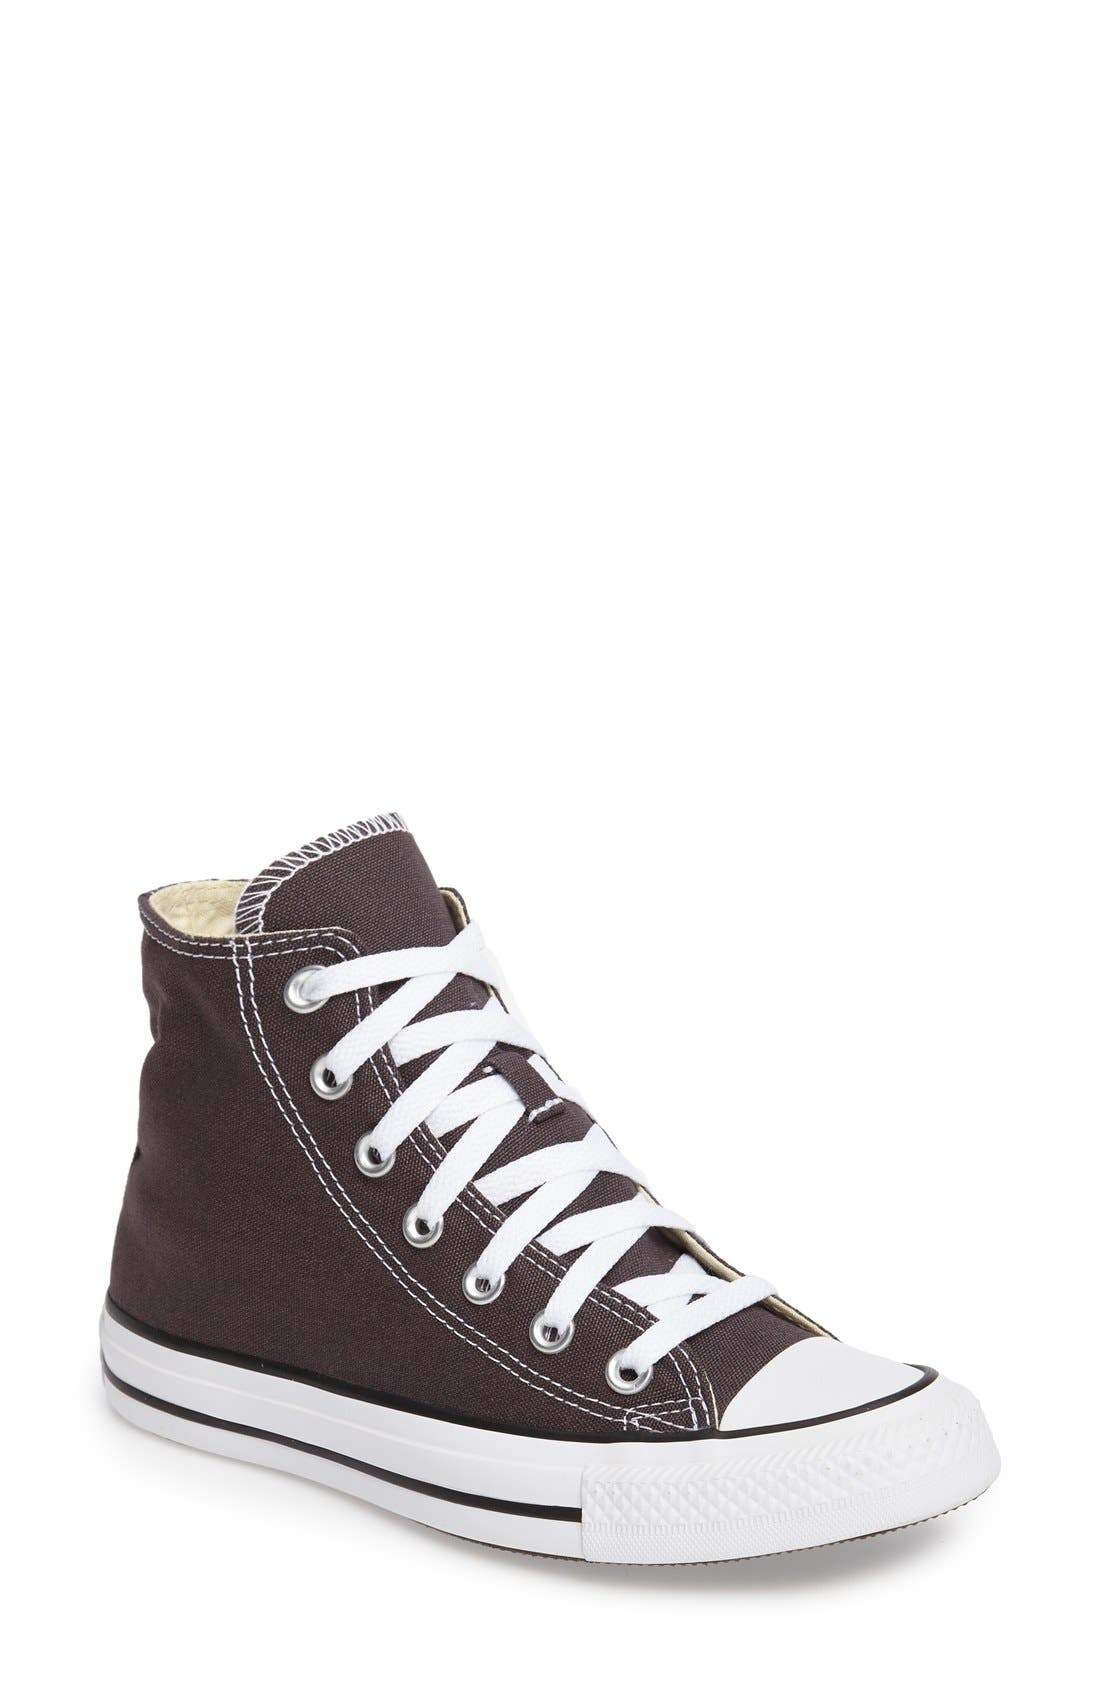 Alternate Image 1 Selected - Converse Chuck Taylor® All Star® Seasonal High Top Sneaker (Women)